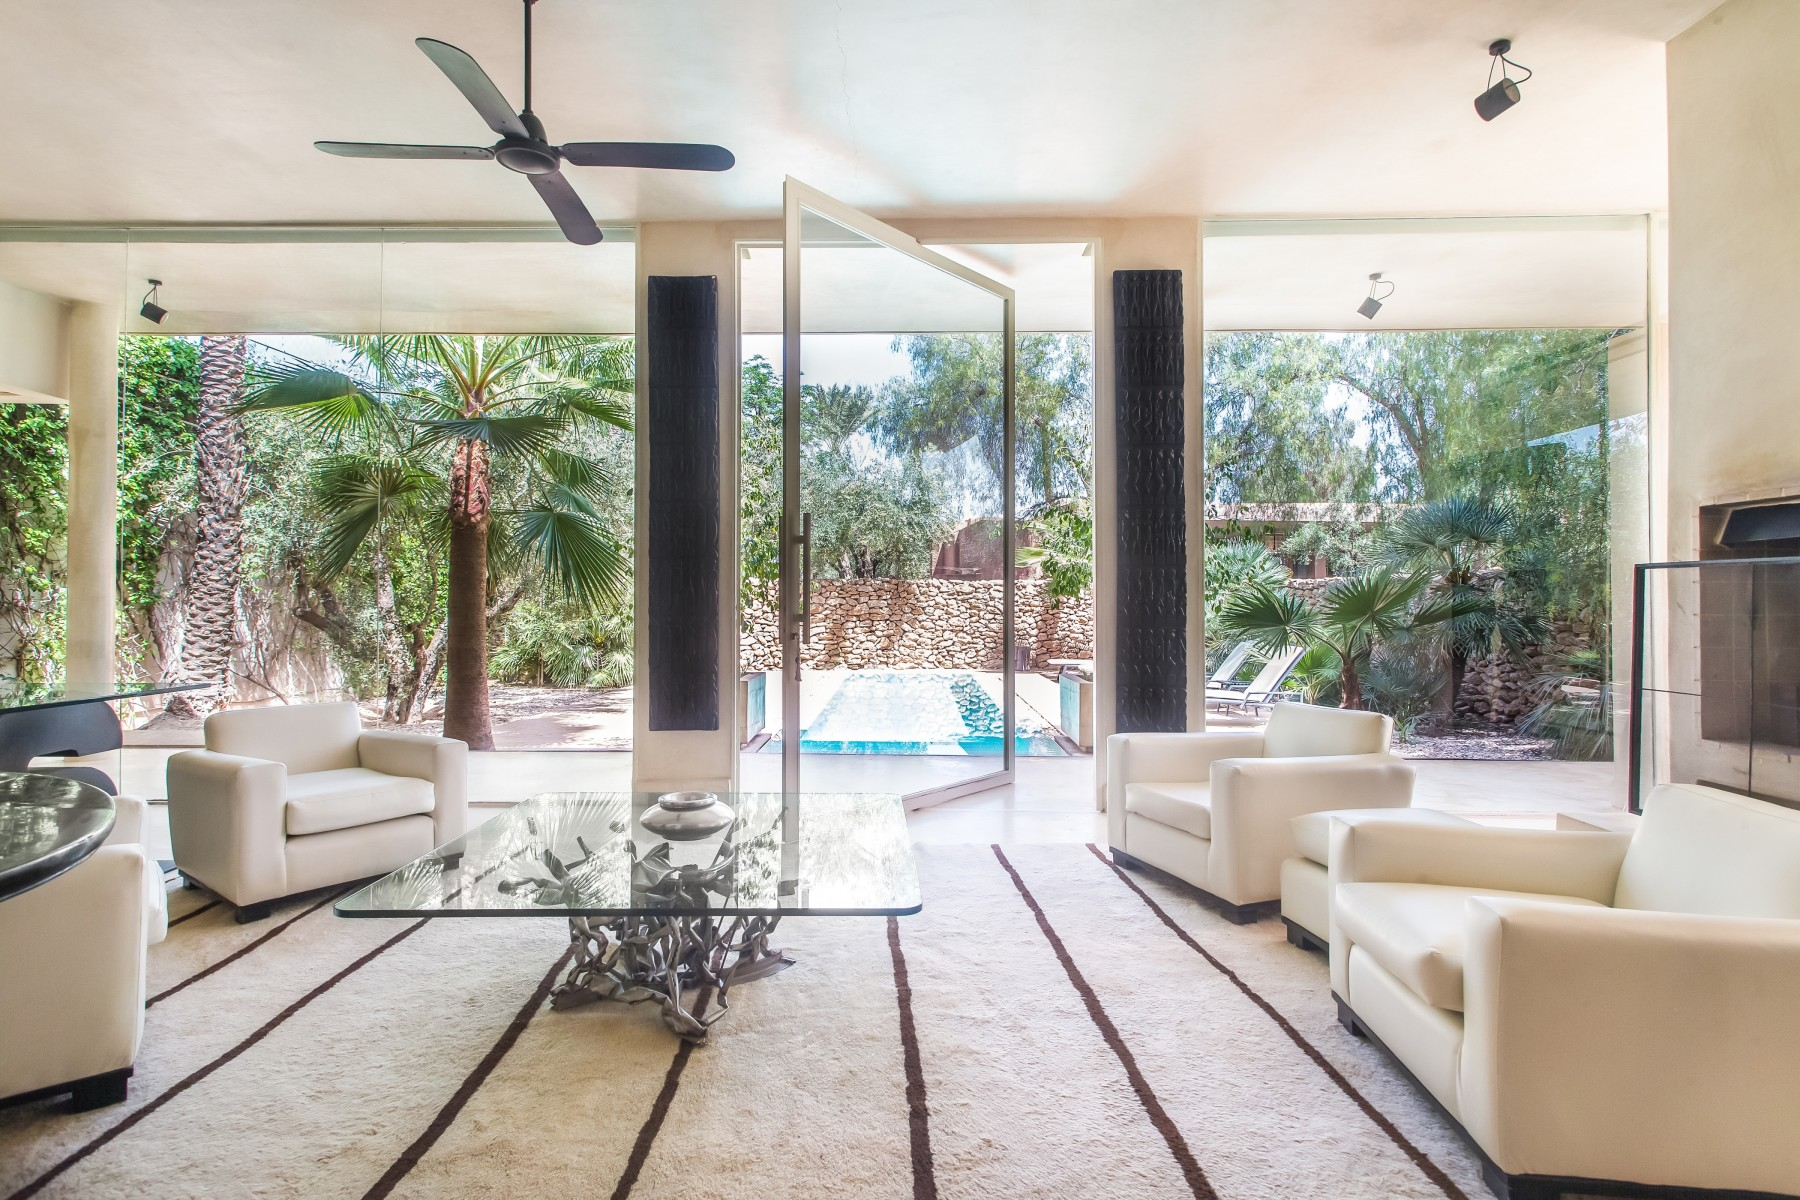 Dar sabra hotel marrakech h tel luxe palmeraie marrakech for Hotel avec piscine interieur